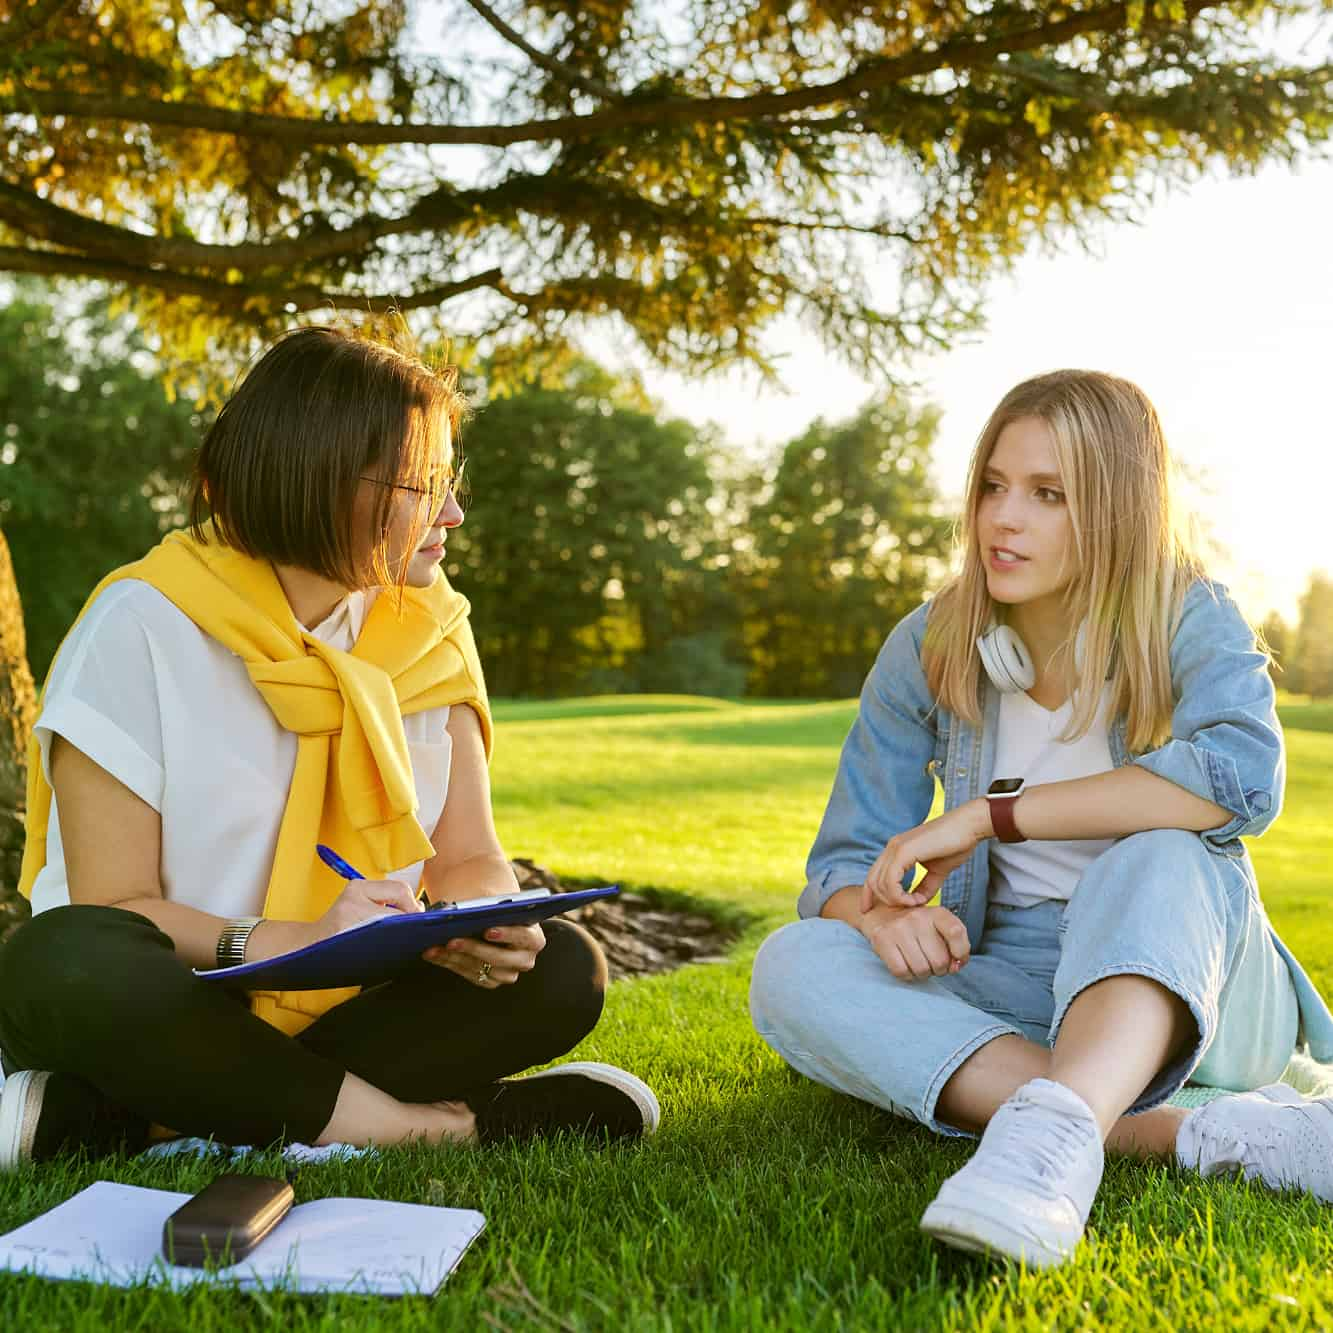 Innate Therapies Australia - Ladies talking in a park